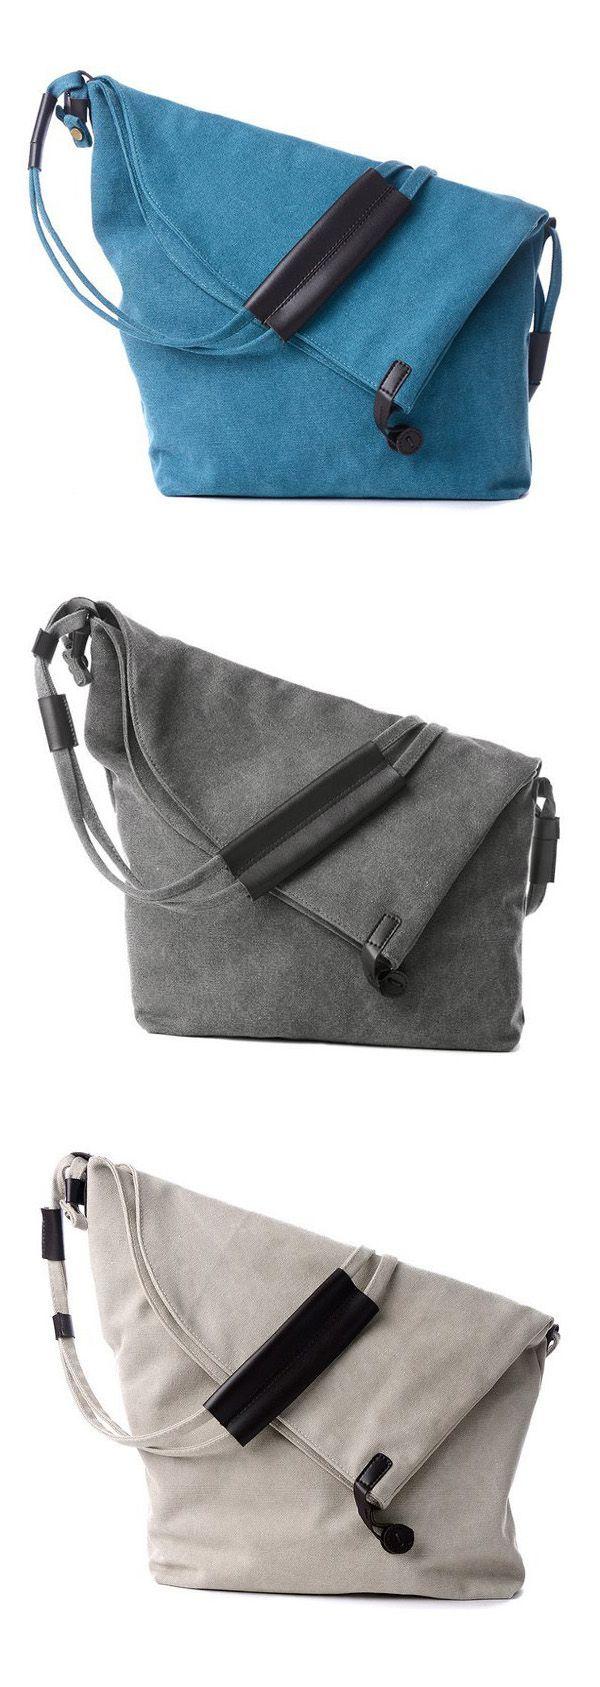 $20.13 Leisure Retro Shoulder Bags